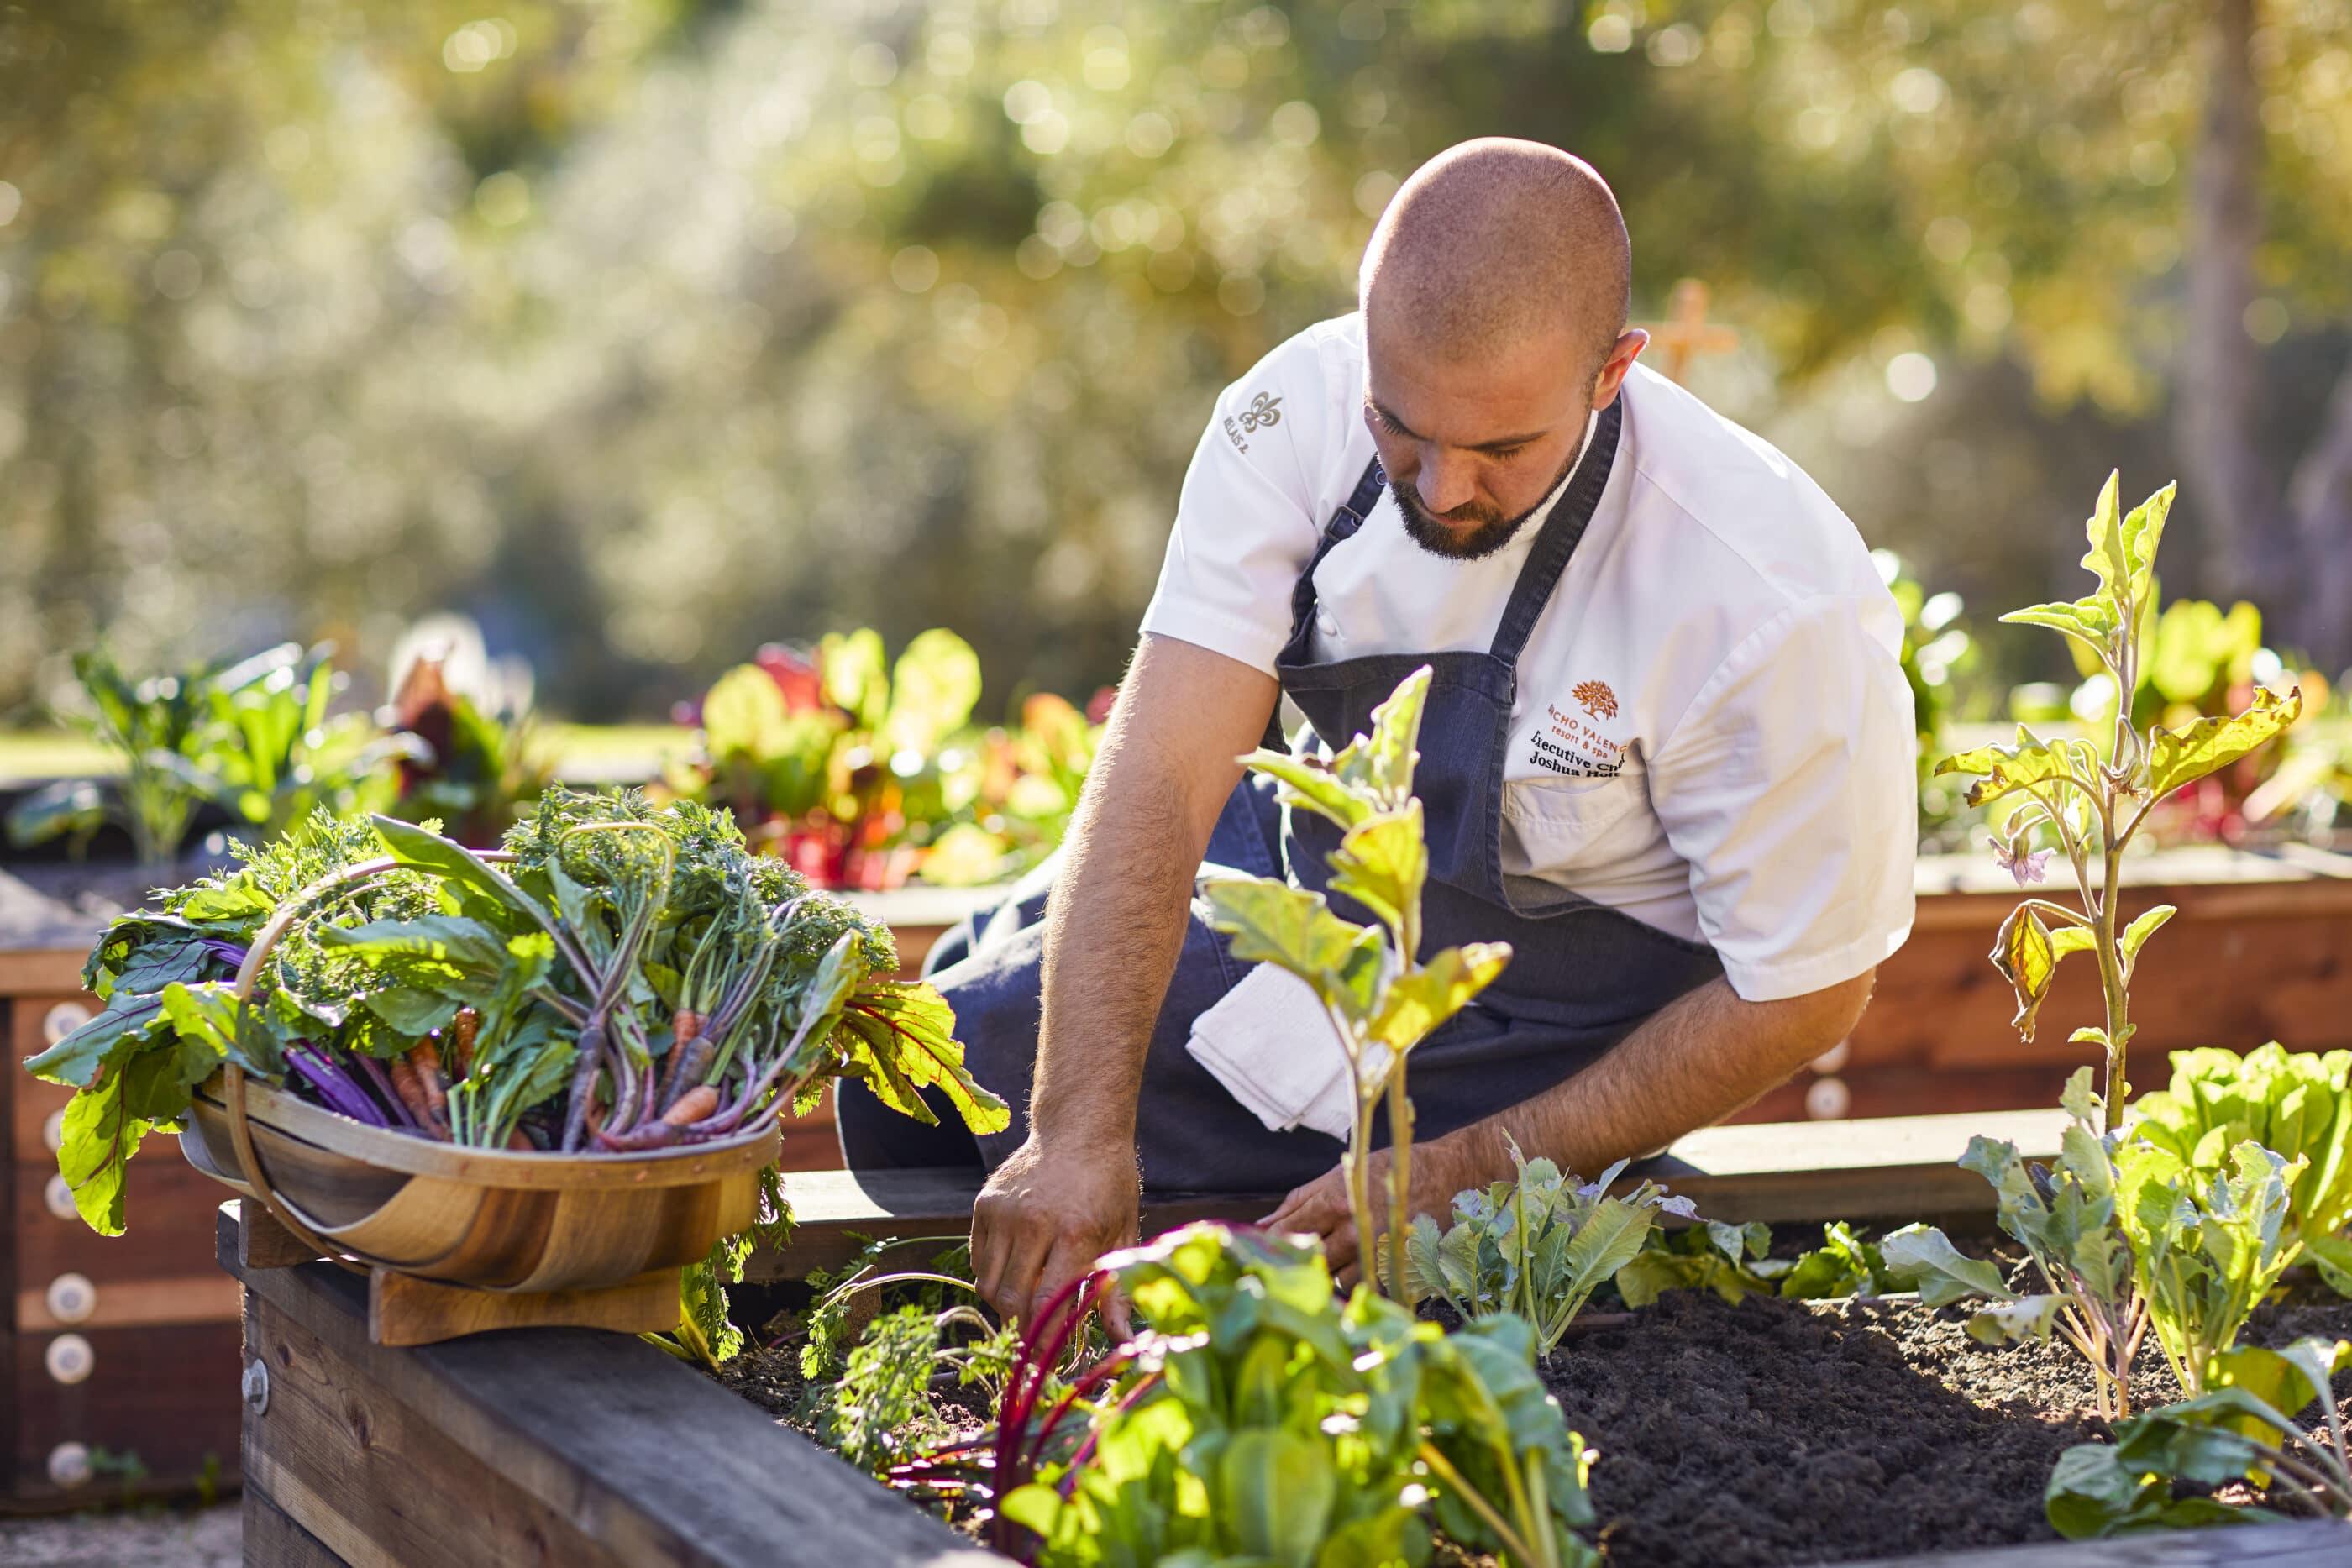 Chef Joshua picks greens in the resort garden.